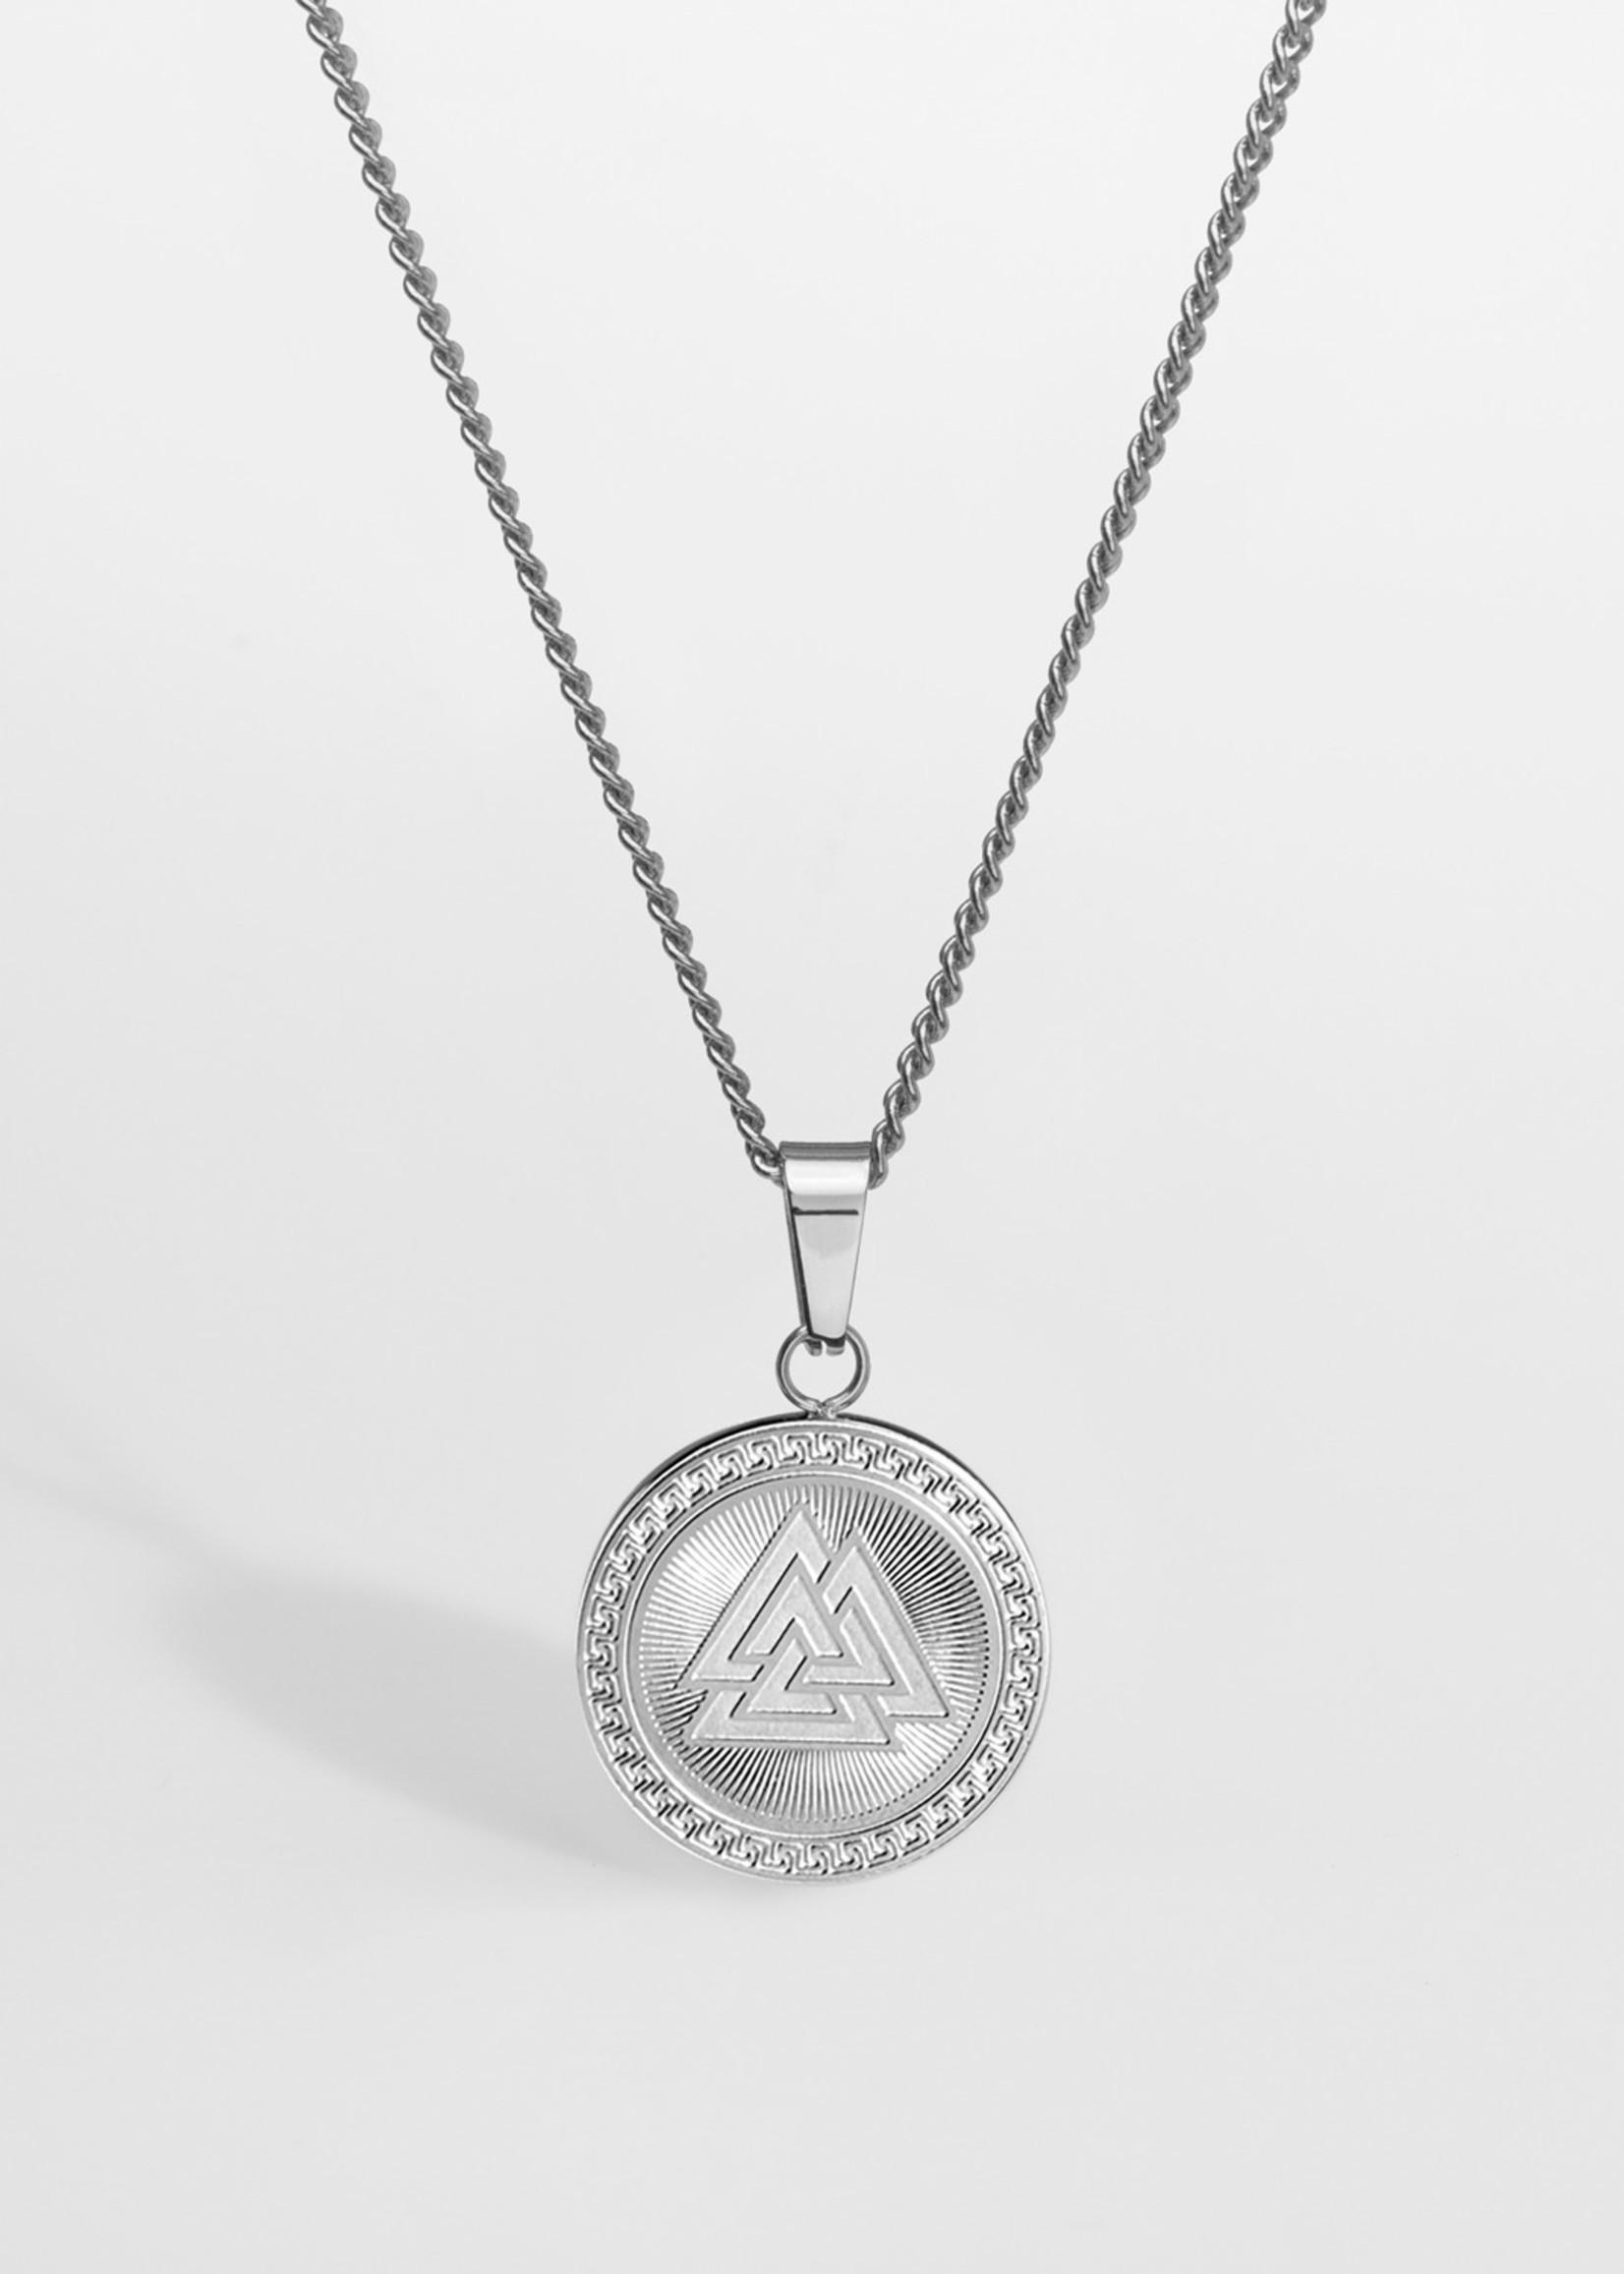 Northern Legacy nl valknut pendant-silver tone